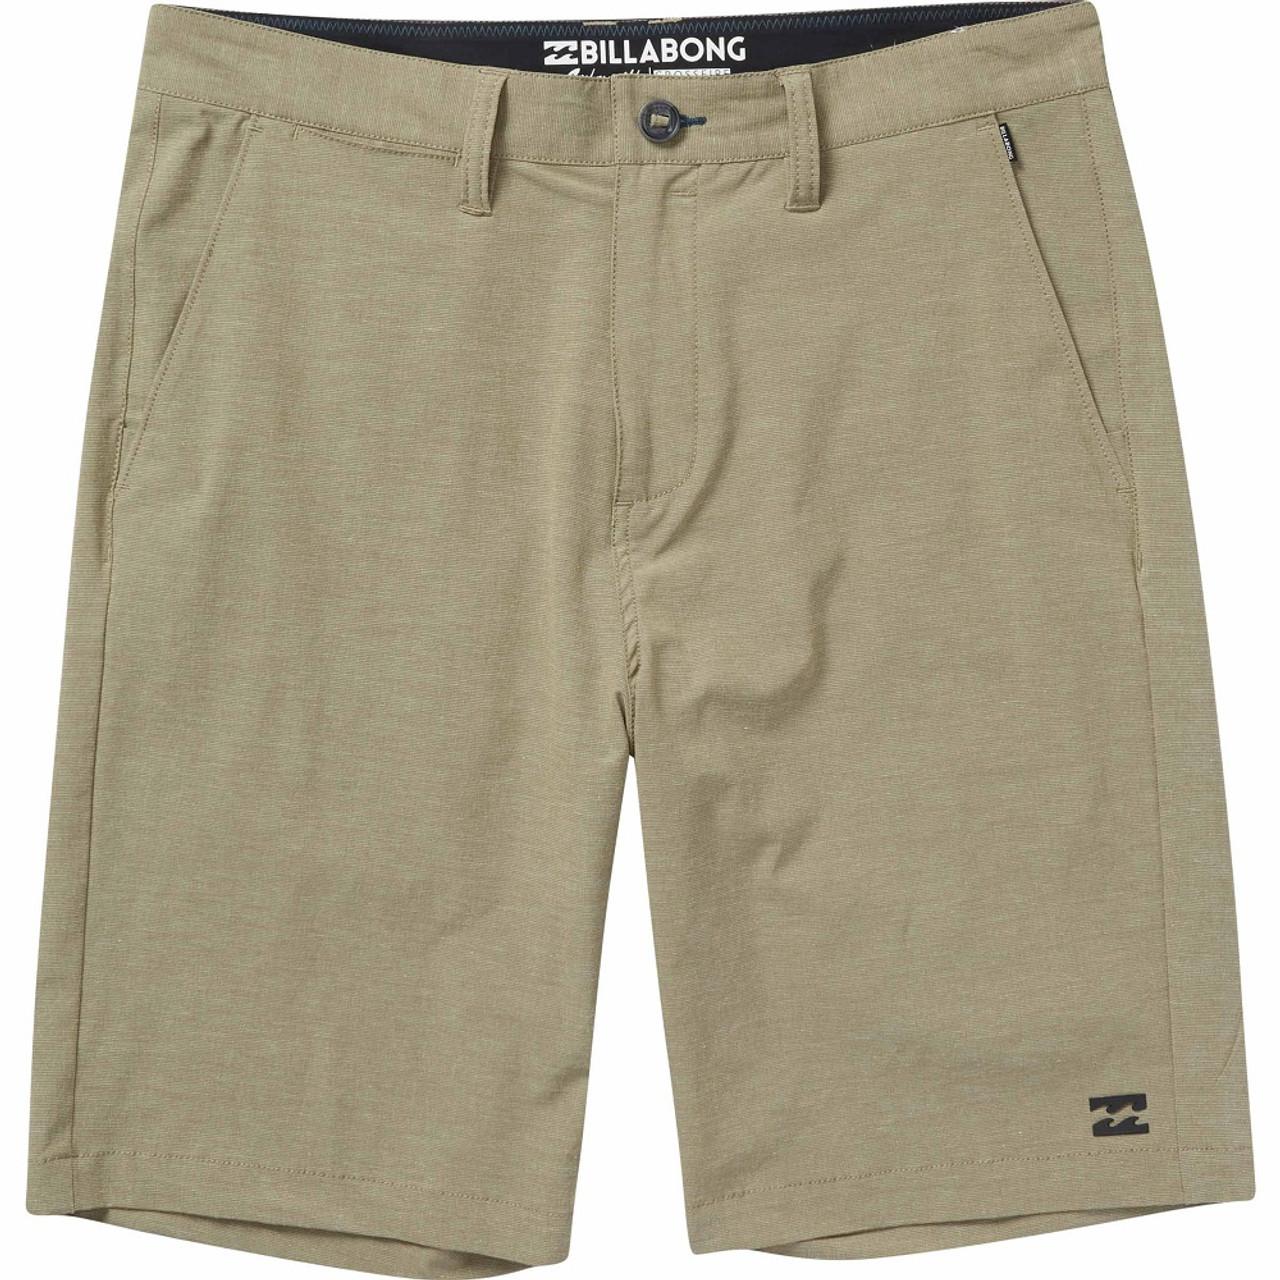 84dab86f32 Billabong CrossFire X Hybrid Shorts Mens Khaki